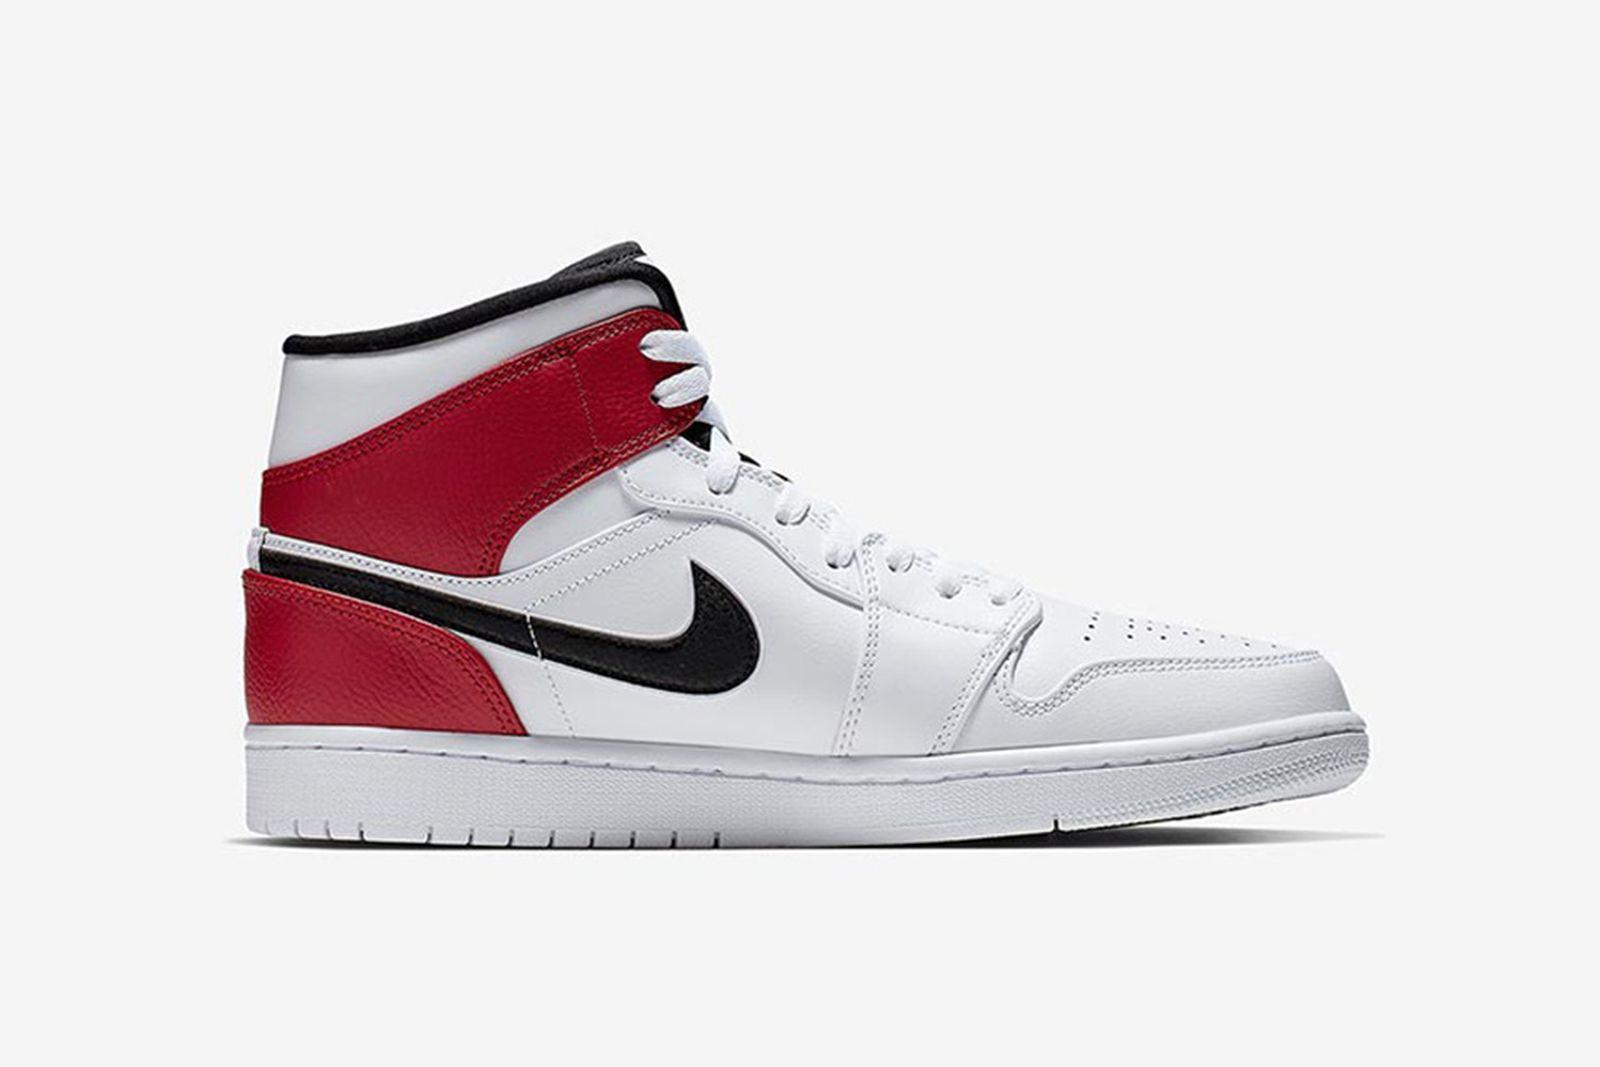 nike air jordan 1 white black red release date price jordan brand